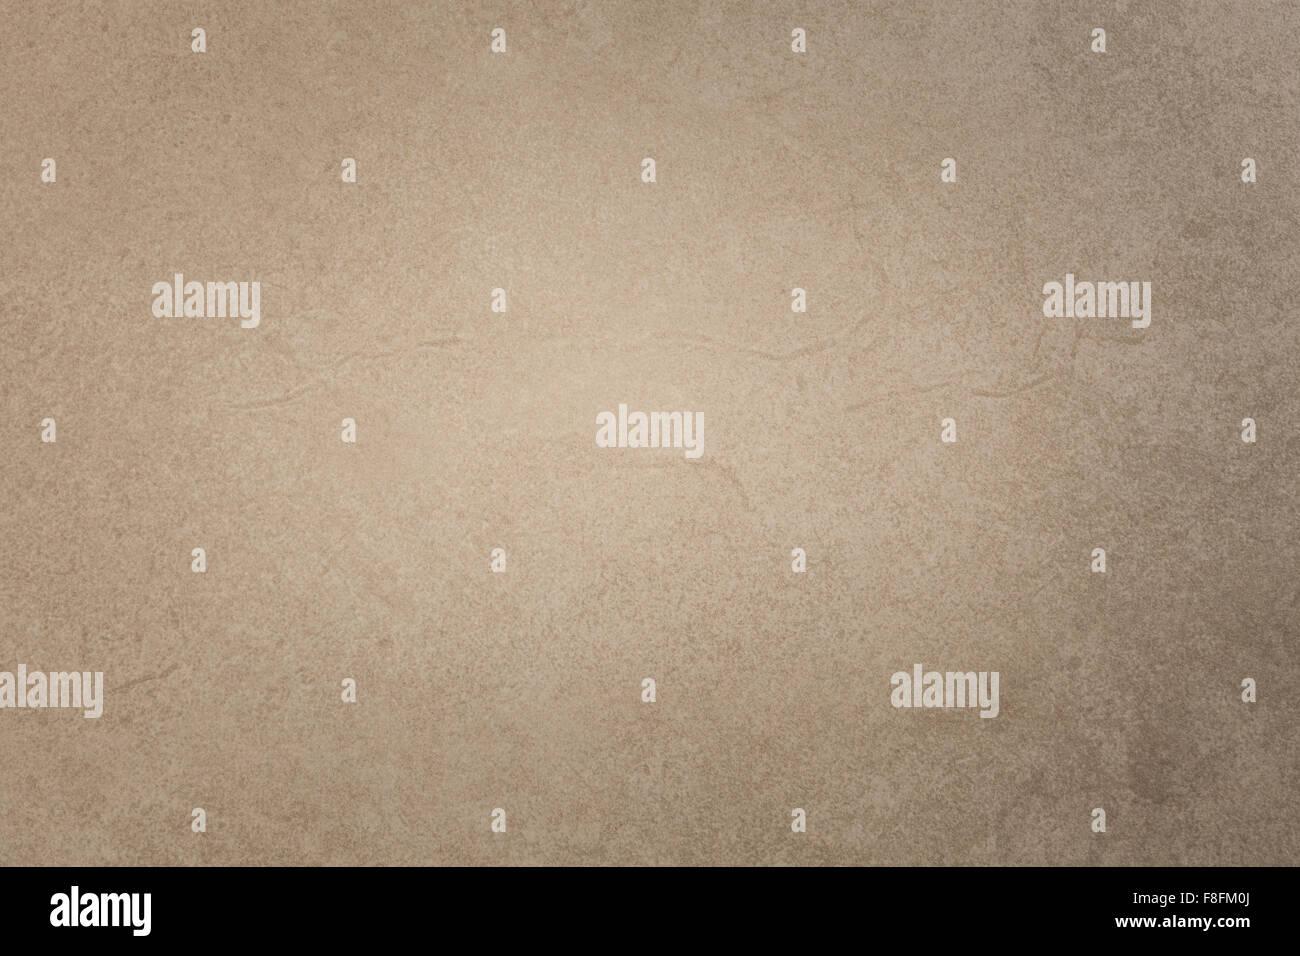 Vintage texture background - Stock Image